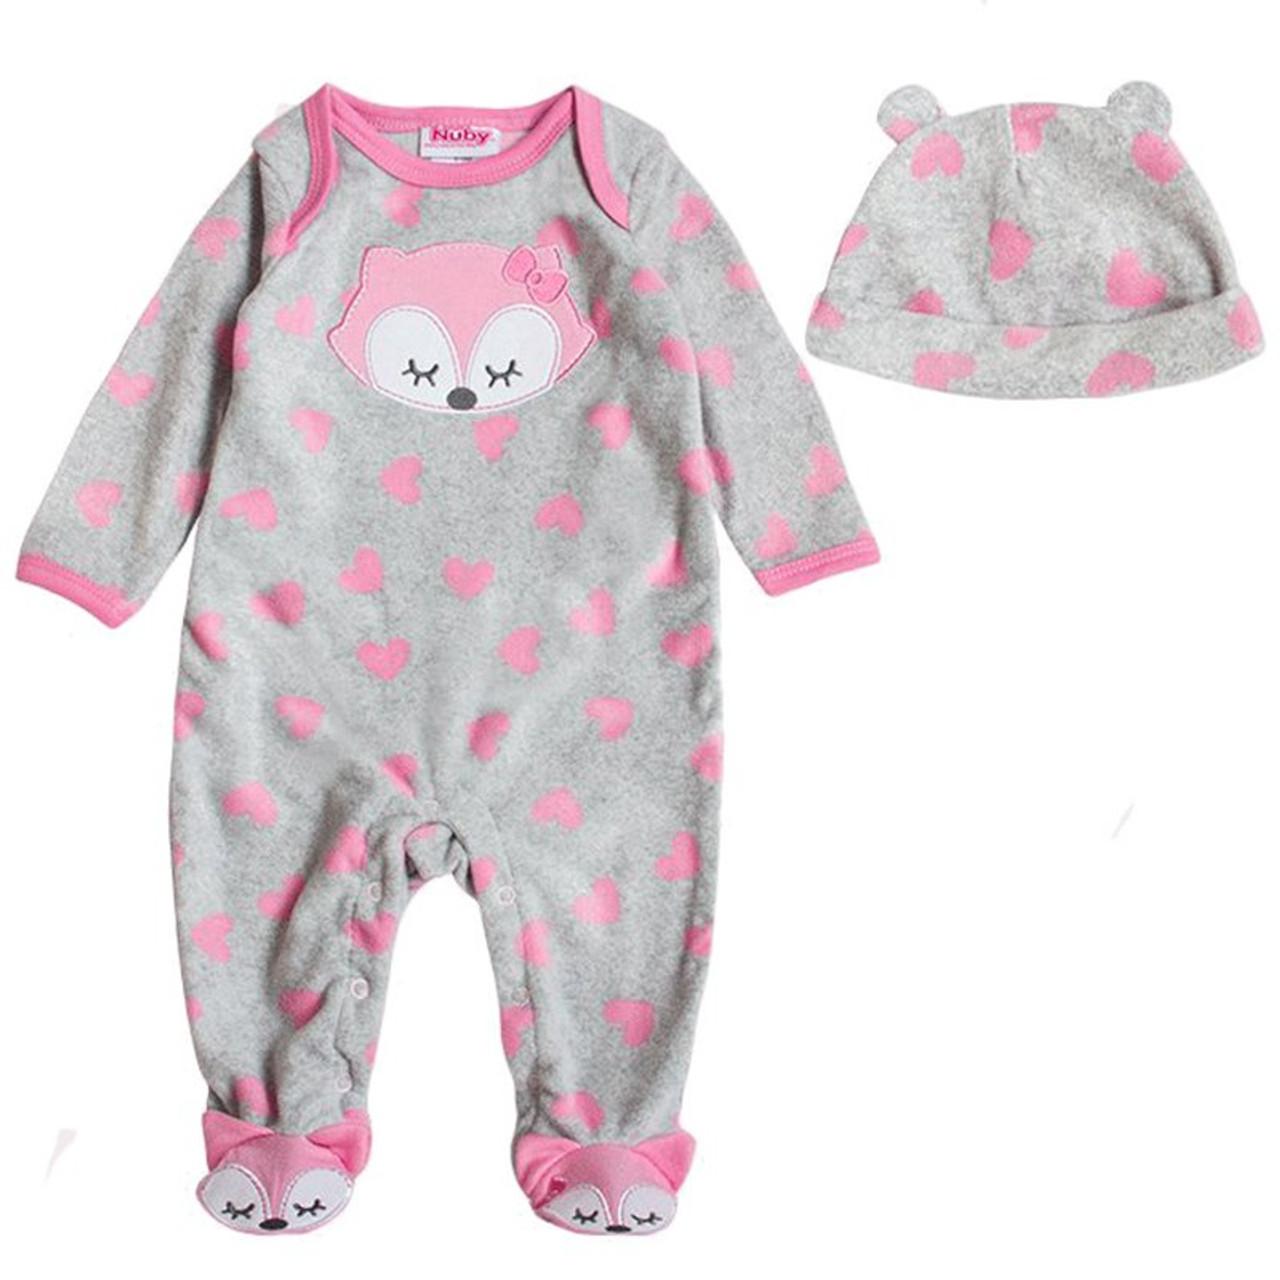 659b8bbe853a Baby Romper Winter Coral Fleece Long Sleeve Hooded Velour Cartoon ...